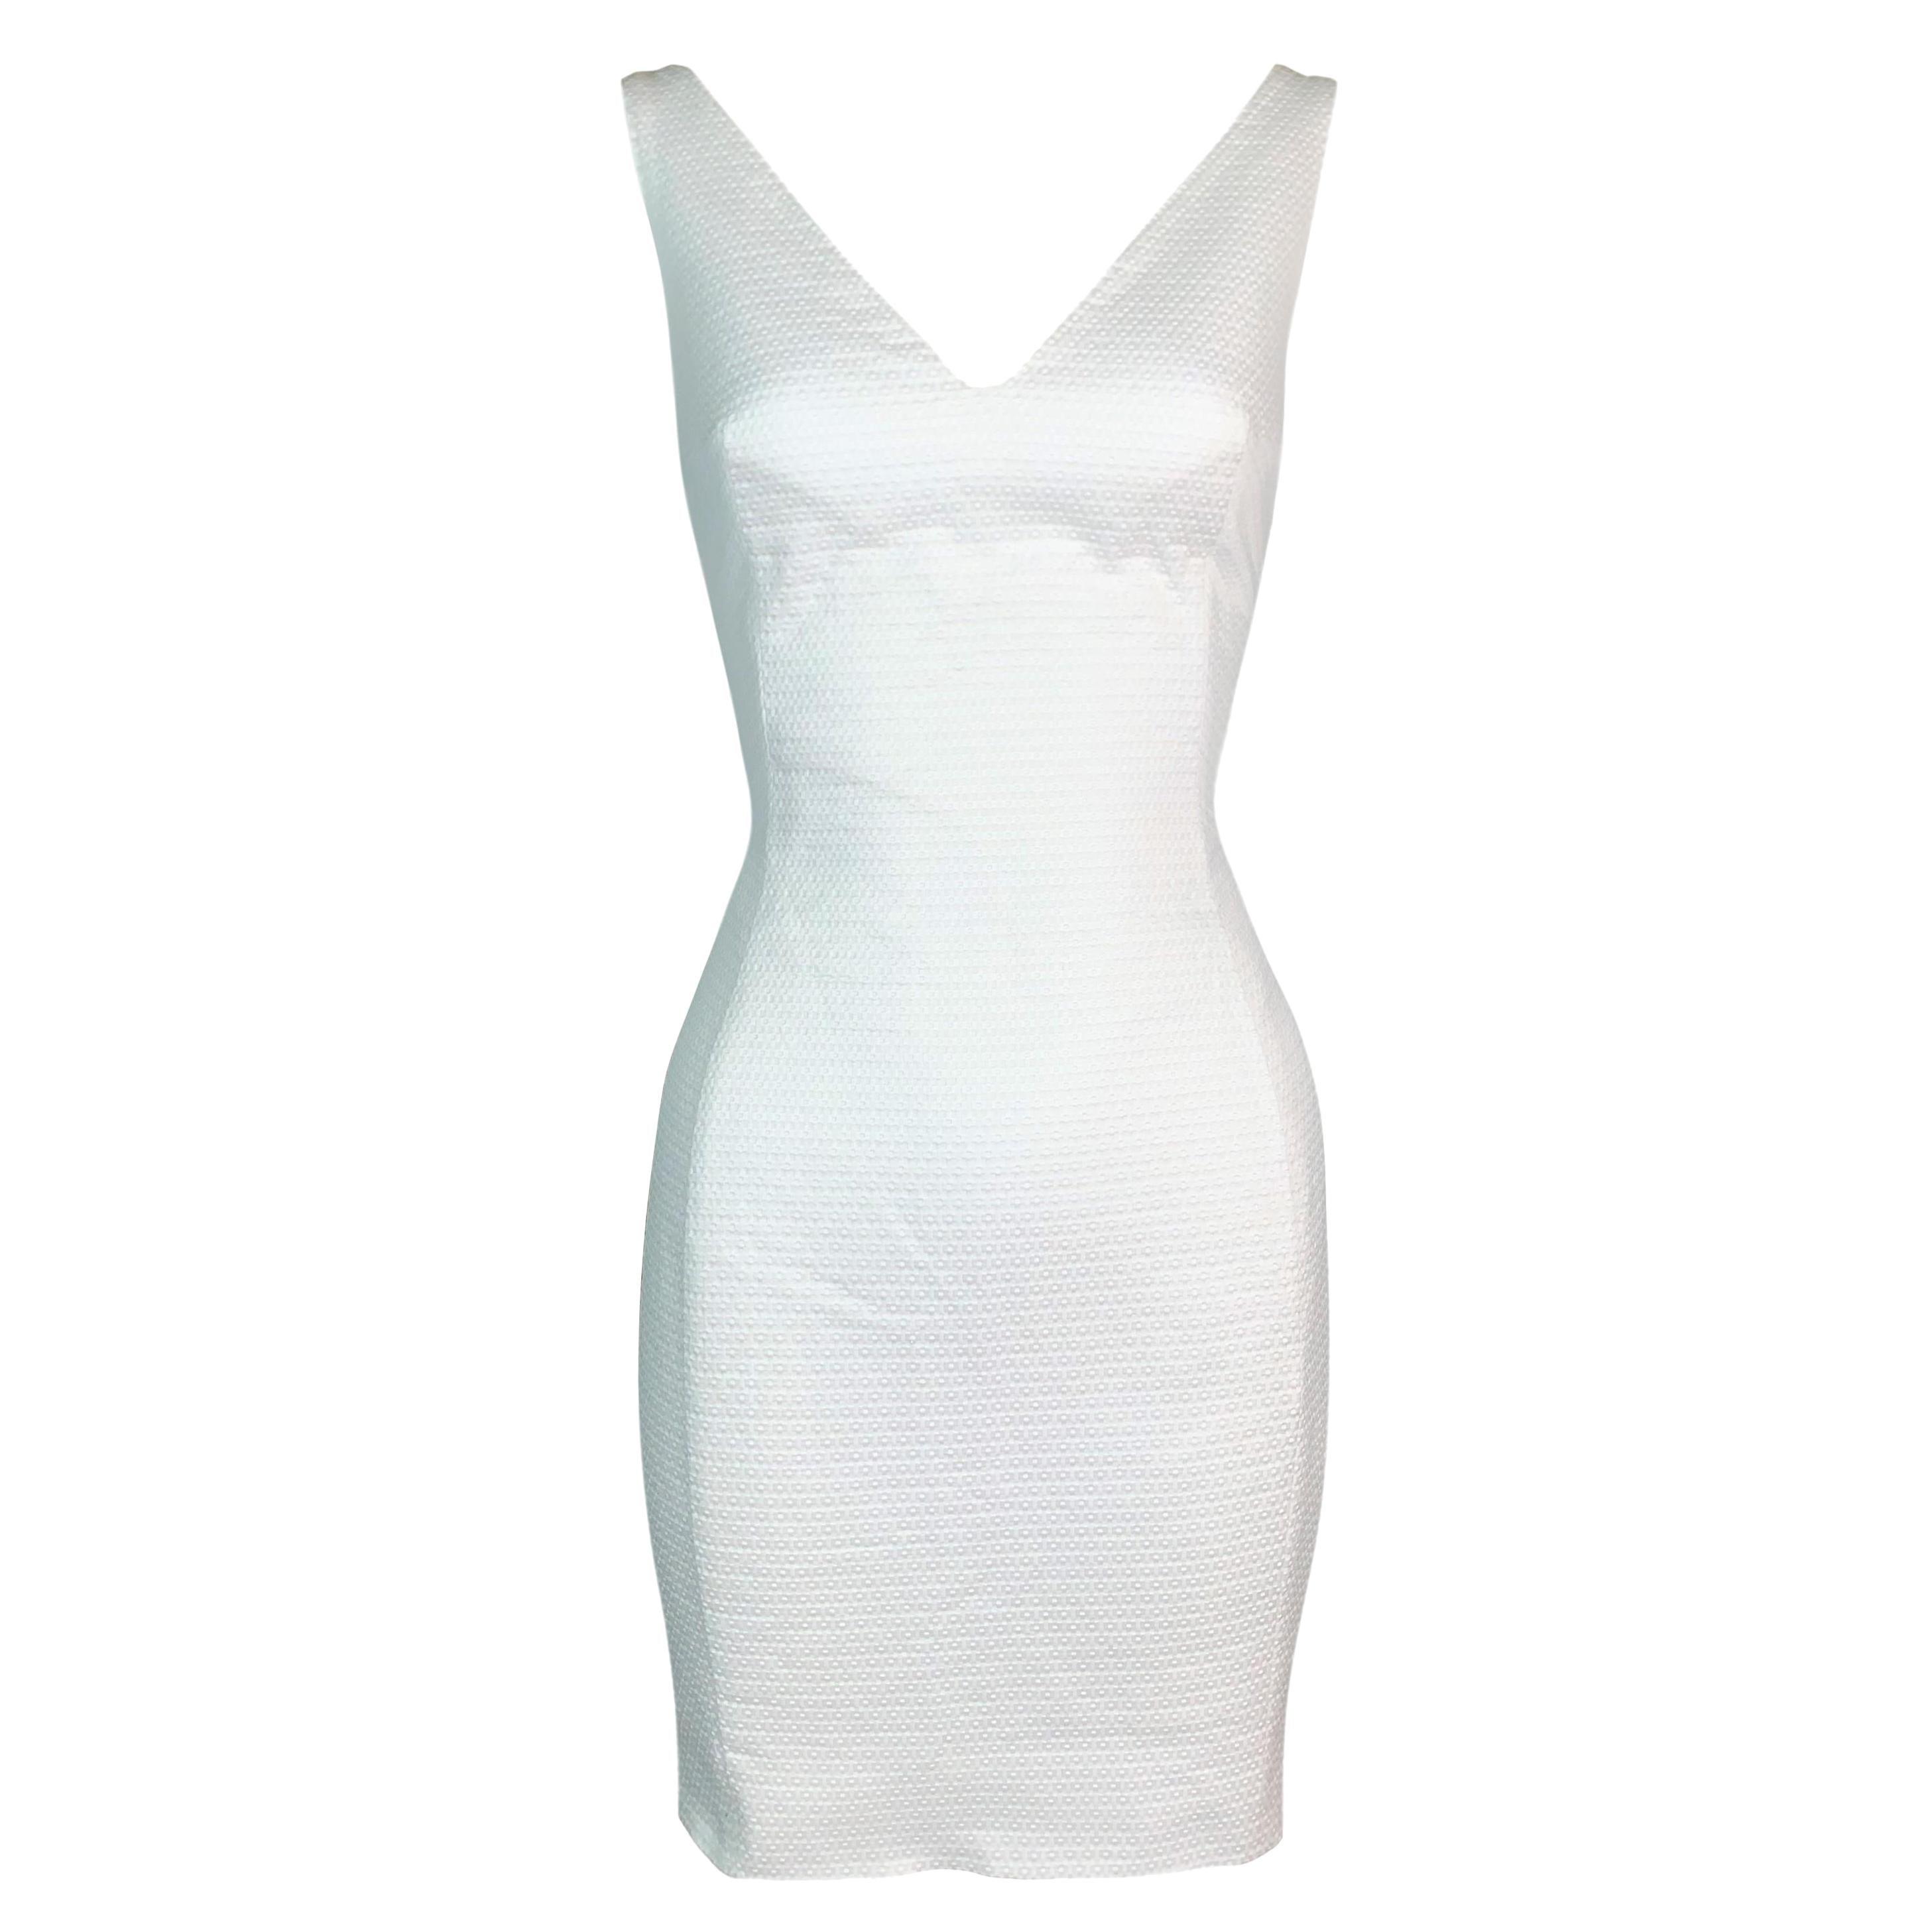 S/S 1995 John Galliano Pin-Up Ivory Textured Wiggle Mini Dress